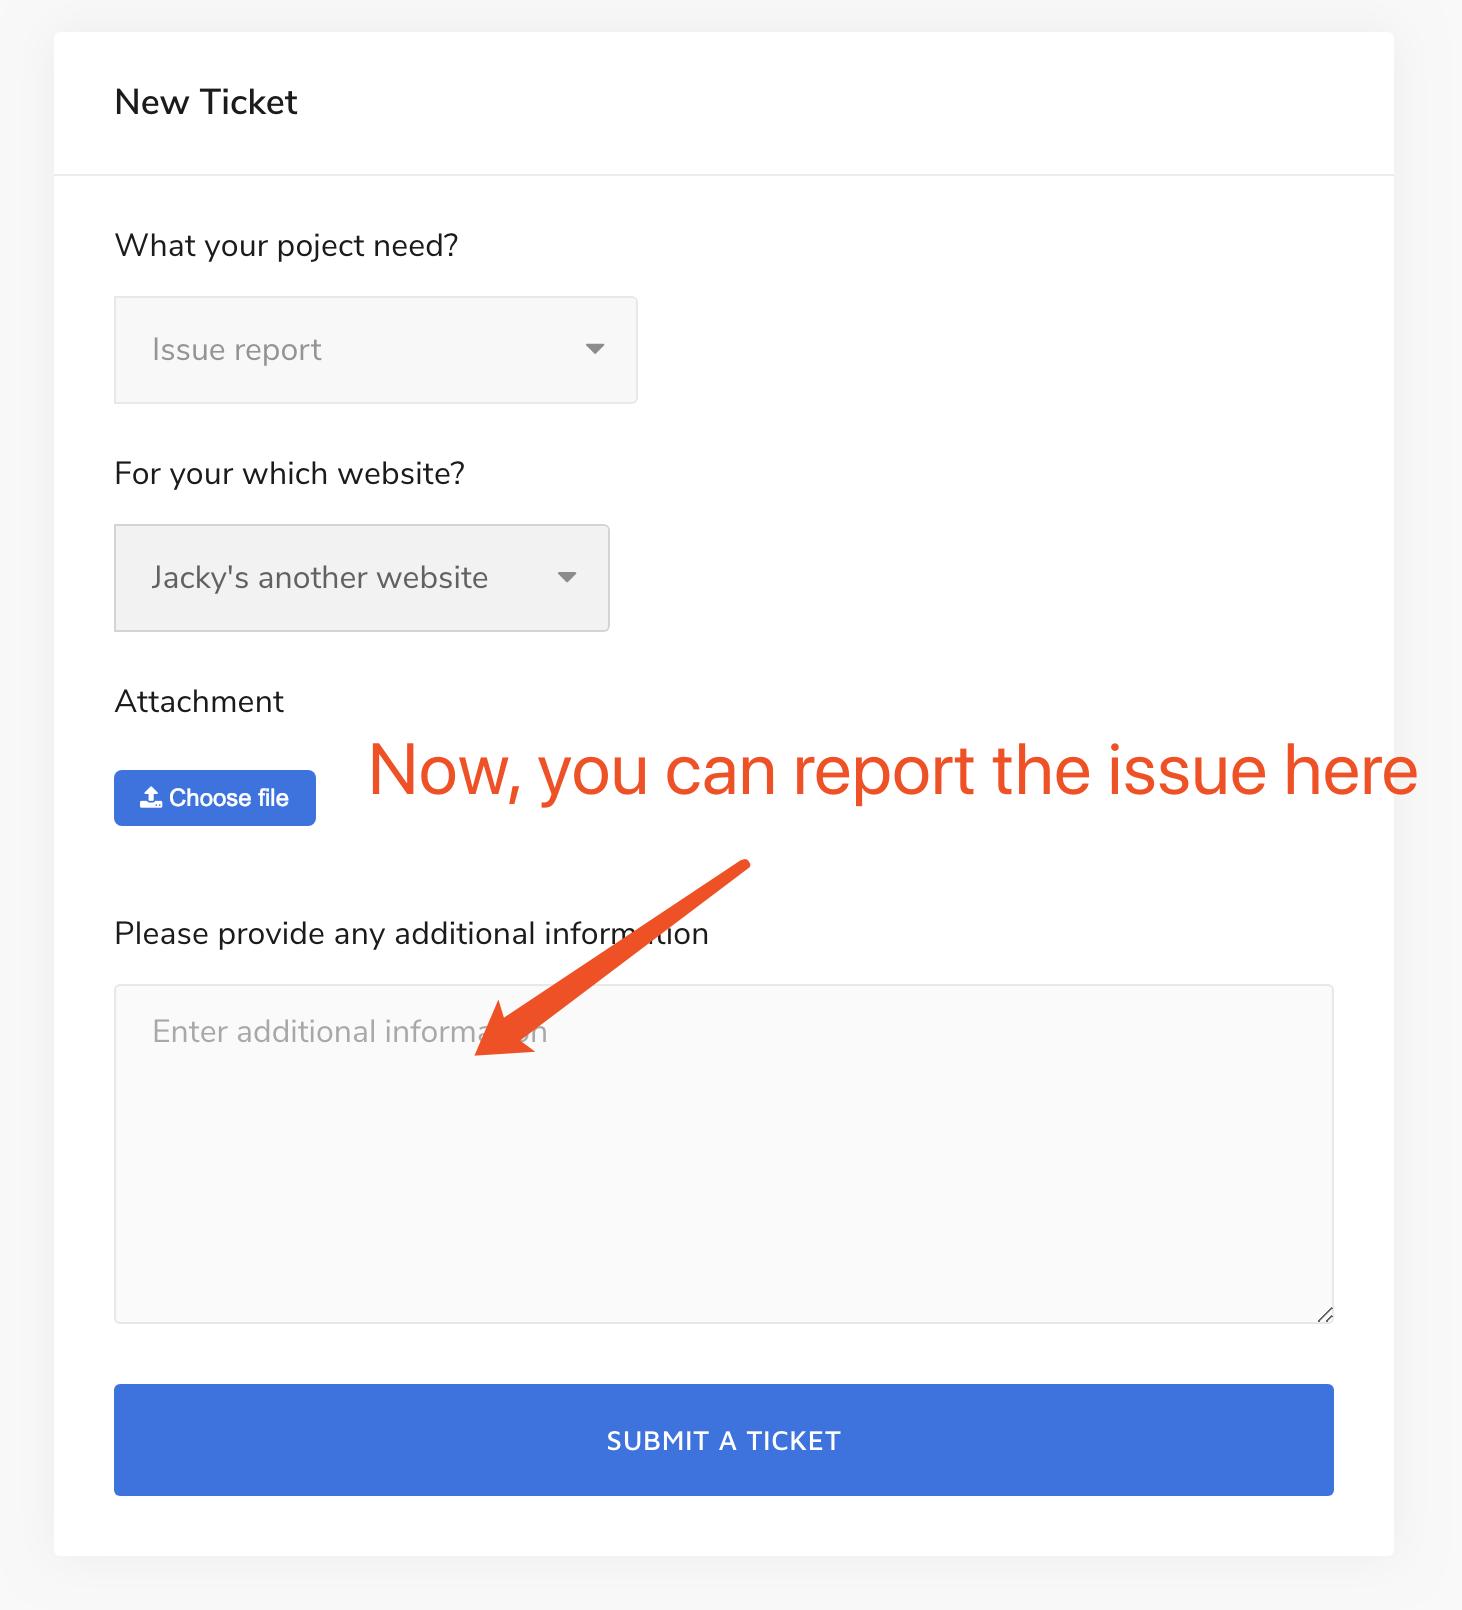 https://static.okweb.com.au/zone/data/-248487580_support/admin/image/issue-step5_1oSU.png